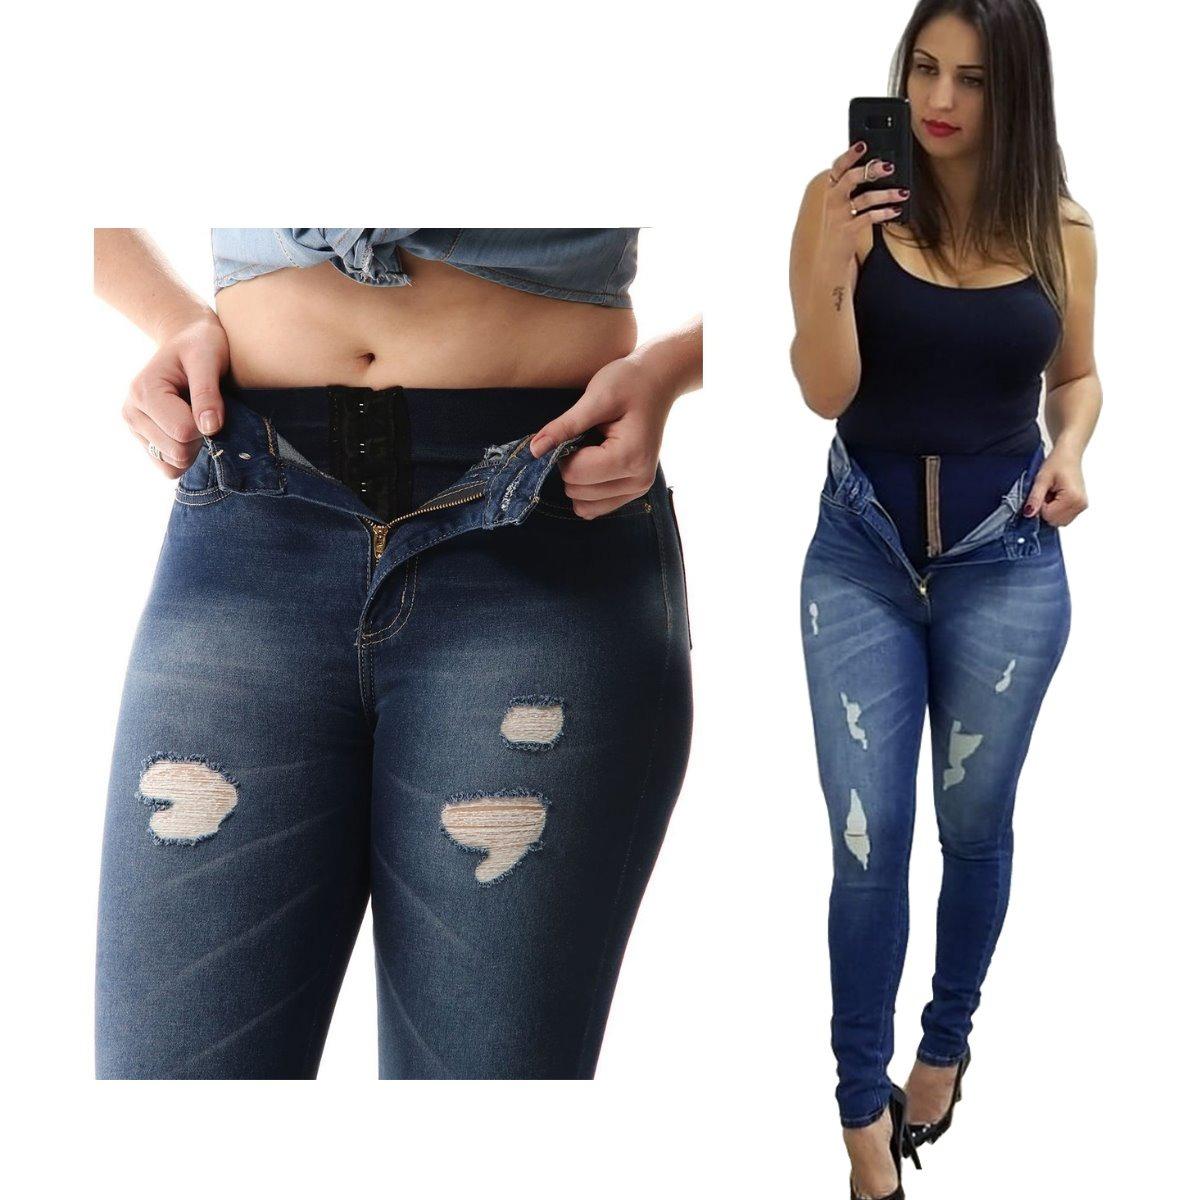 bc90f933c calça jeans feminina super lipo sawary cintura alta. Carregando zoom.